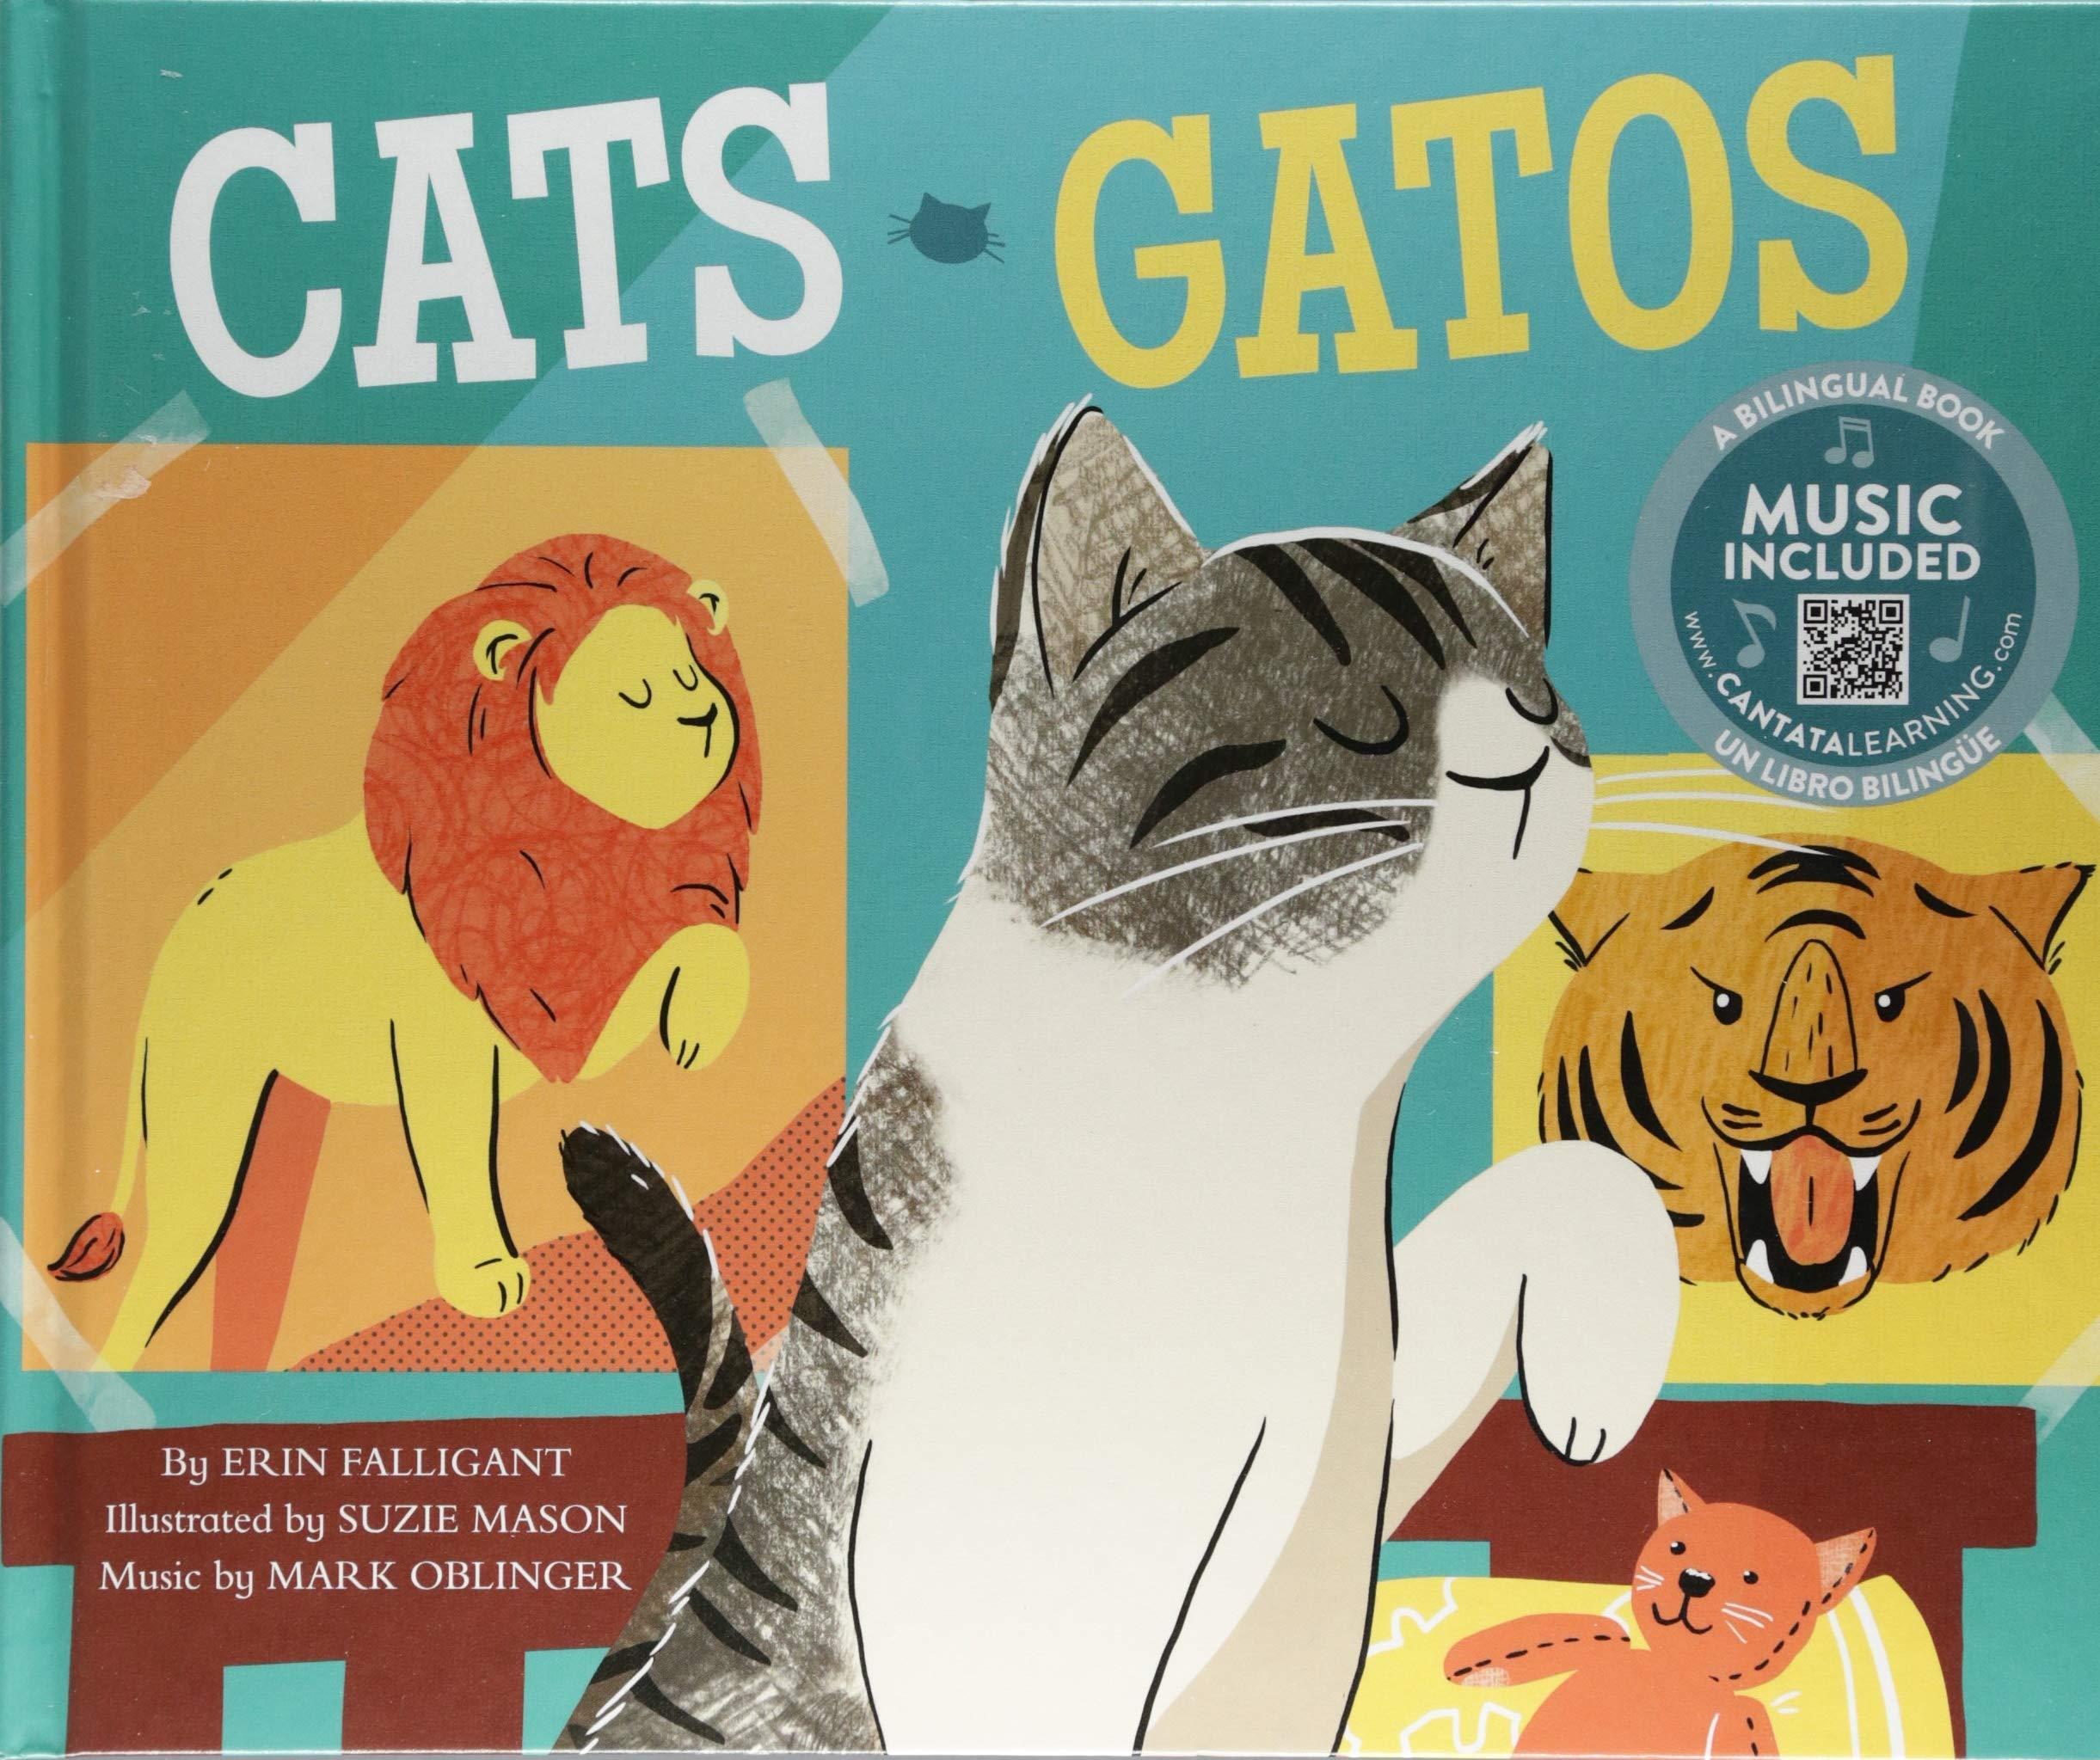 Cats / Gatos (Pets! / iLas mascotas!) (Multilingual Edition) (Multilingual) Library Binding – August 1, 2018